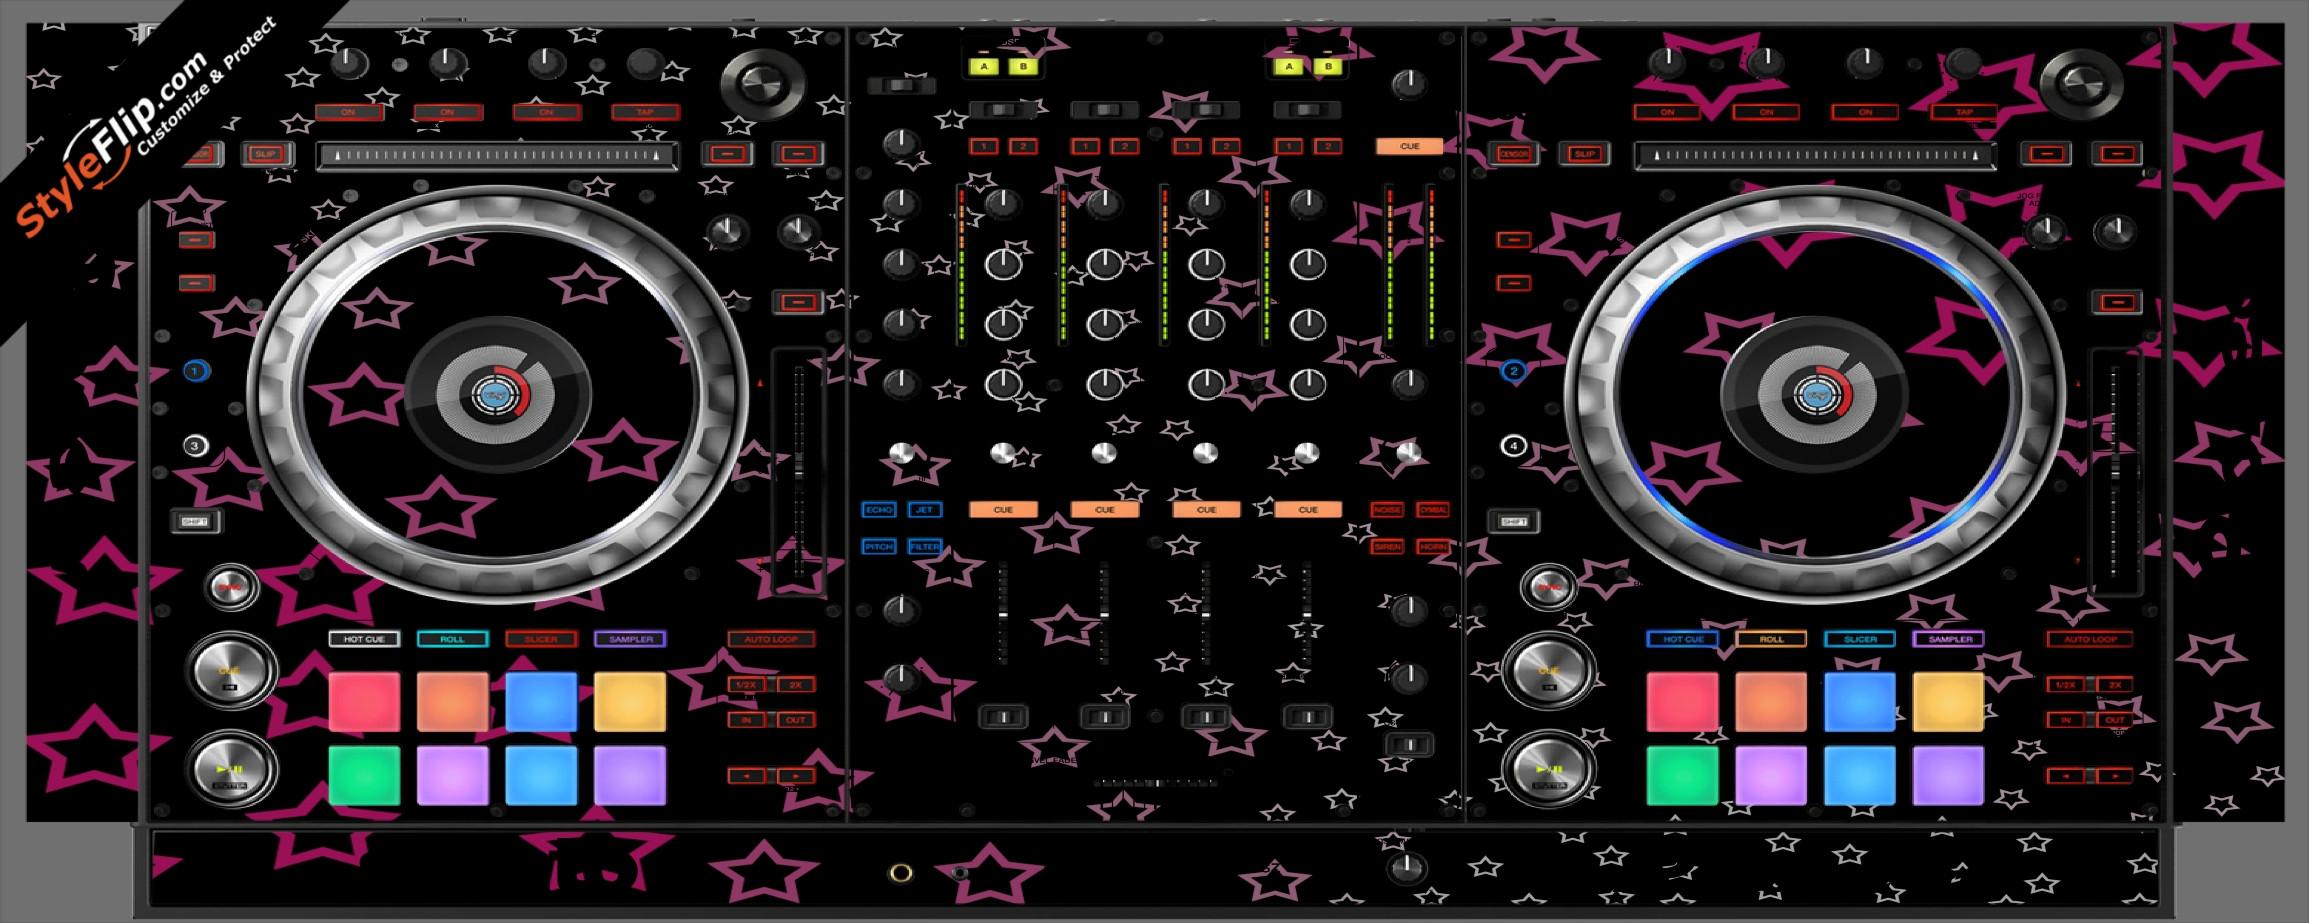 Starry Pioneer DDJ-SZ